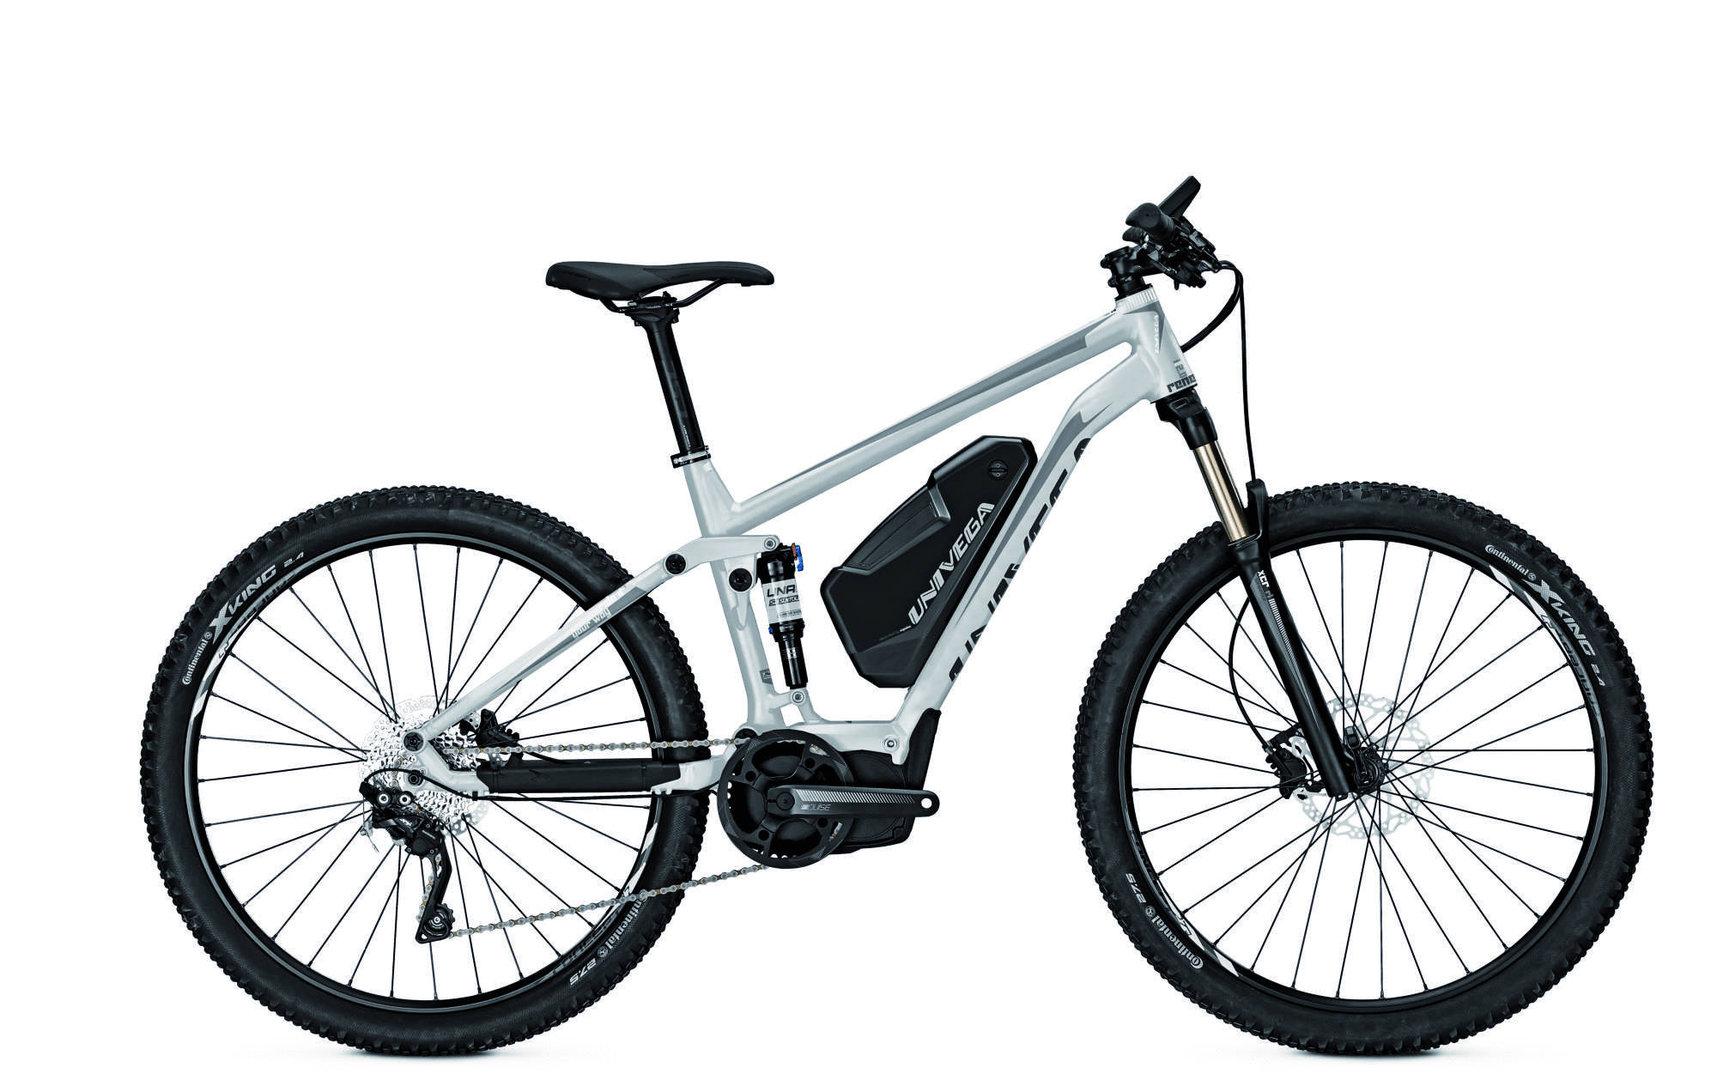 univega renegade i evo 2 0 elektro fahrrad 27 5r ebike 2017. Black Bedroom Furniture Sets. Home Design Ideas